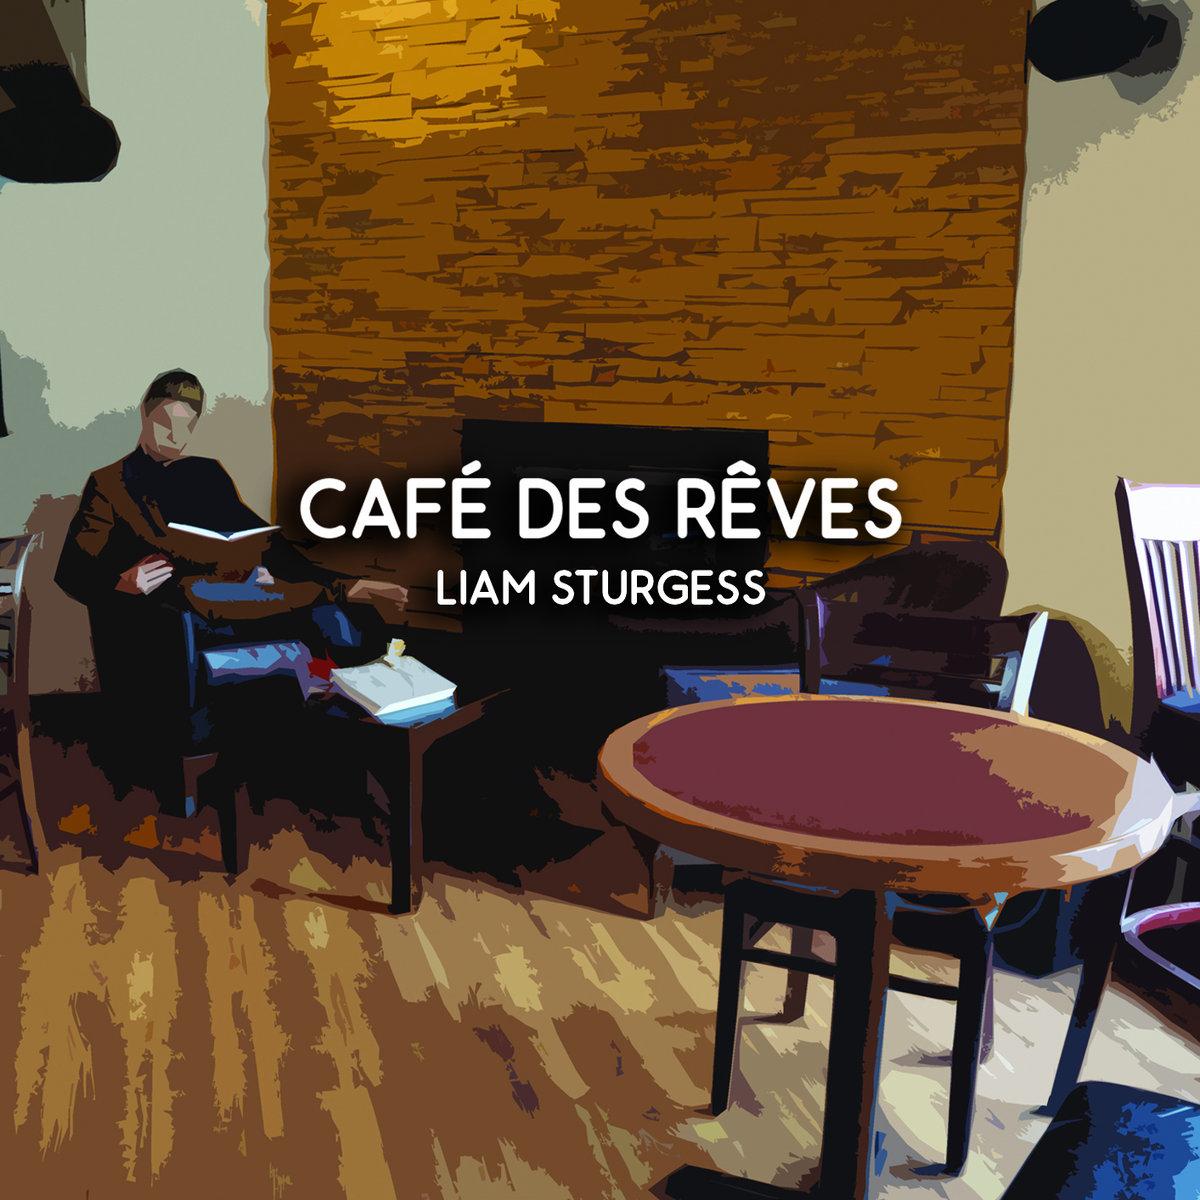 CafedesRevesLiamSturgess.jpg